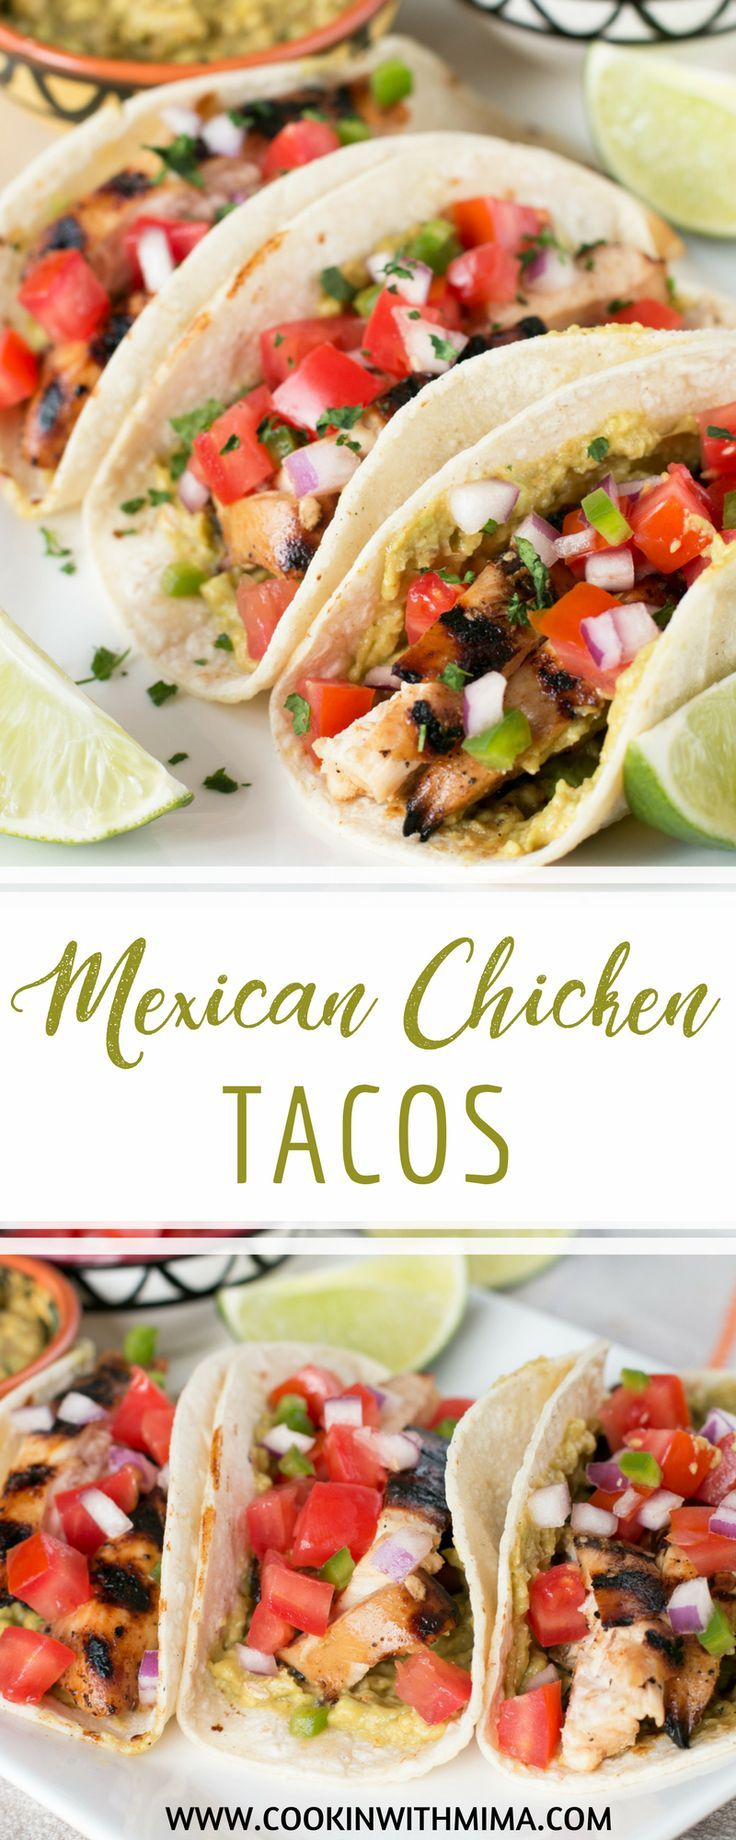 Mexican Chicken Tacos #mexicanchickentacos